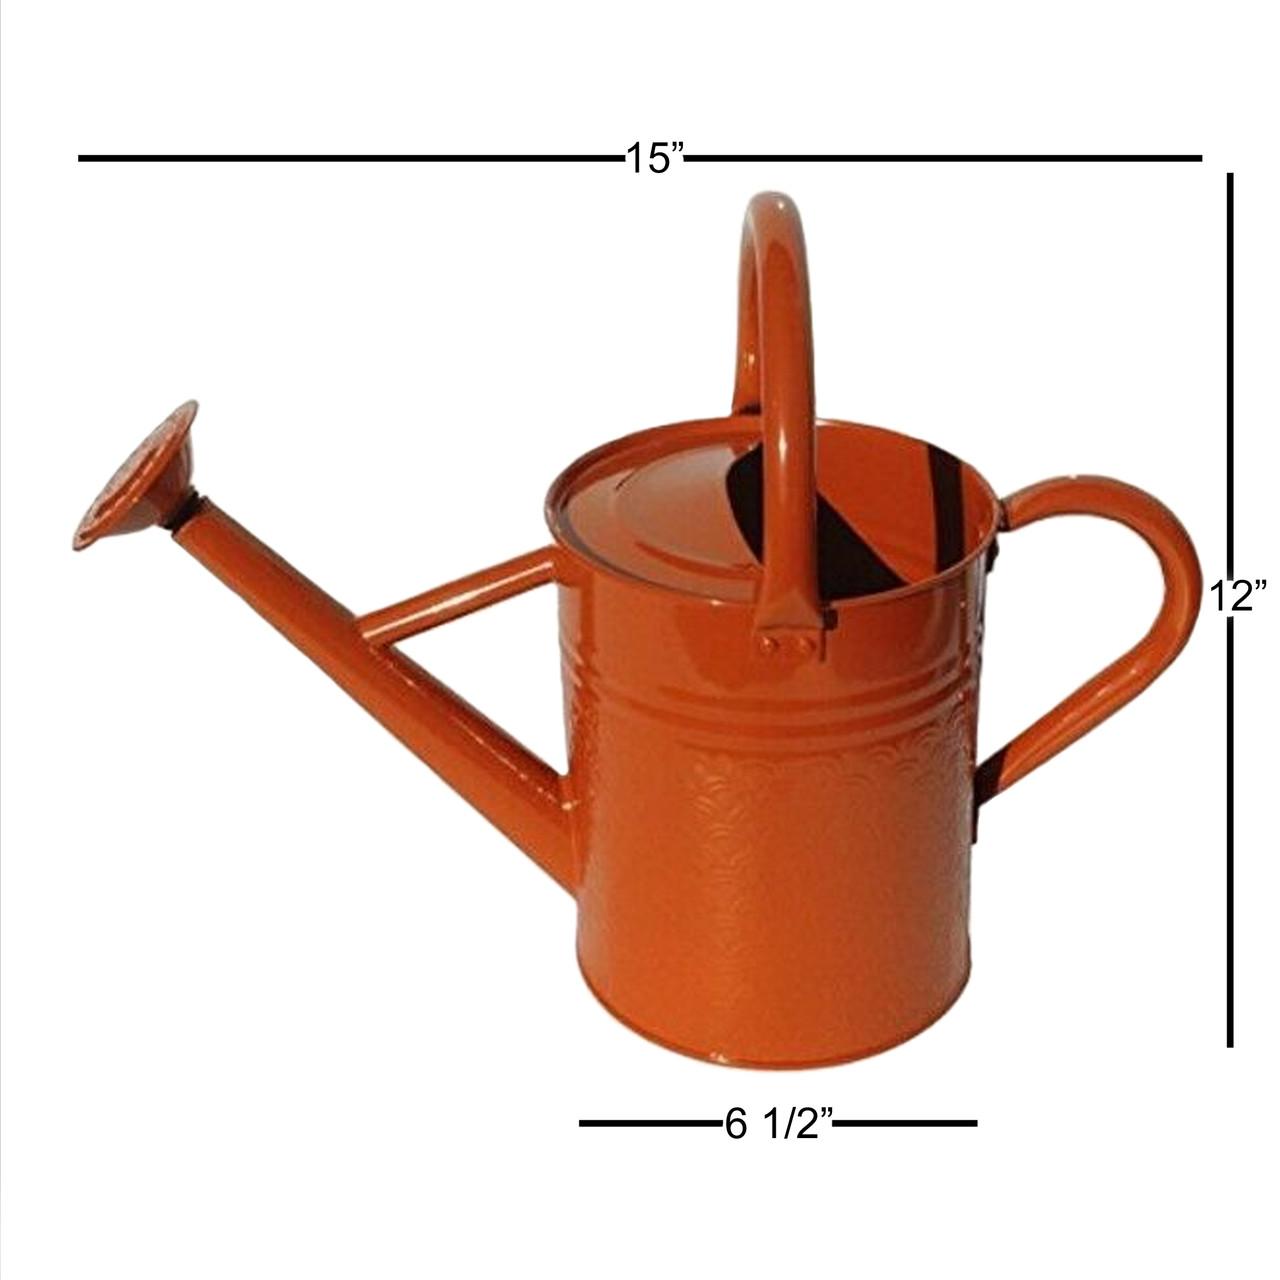 Gardener Select 4L Watering Can #W8105ORA Burnt Orange- 1.06 Gallon